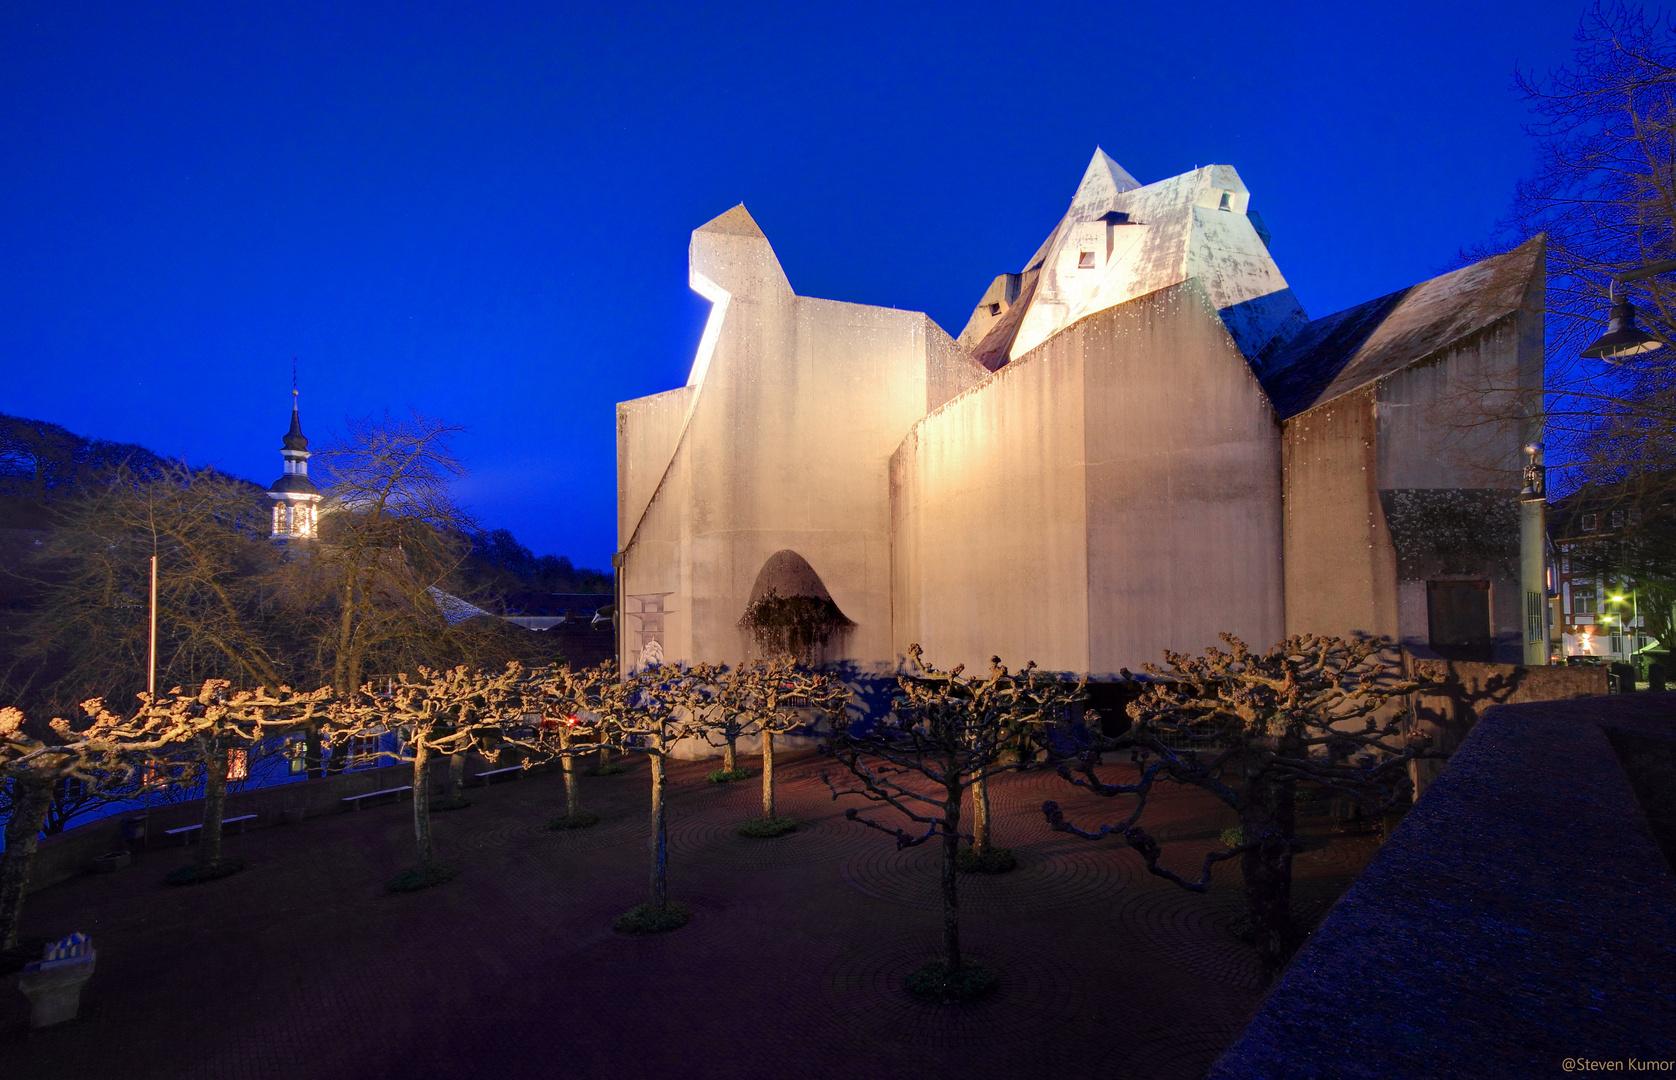 NEVIGES - Wallfahrtskirche